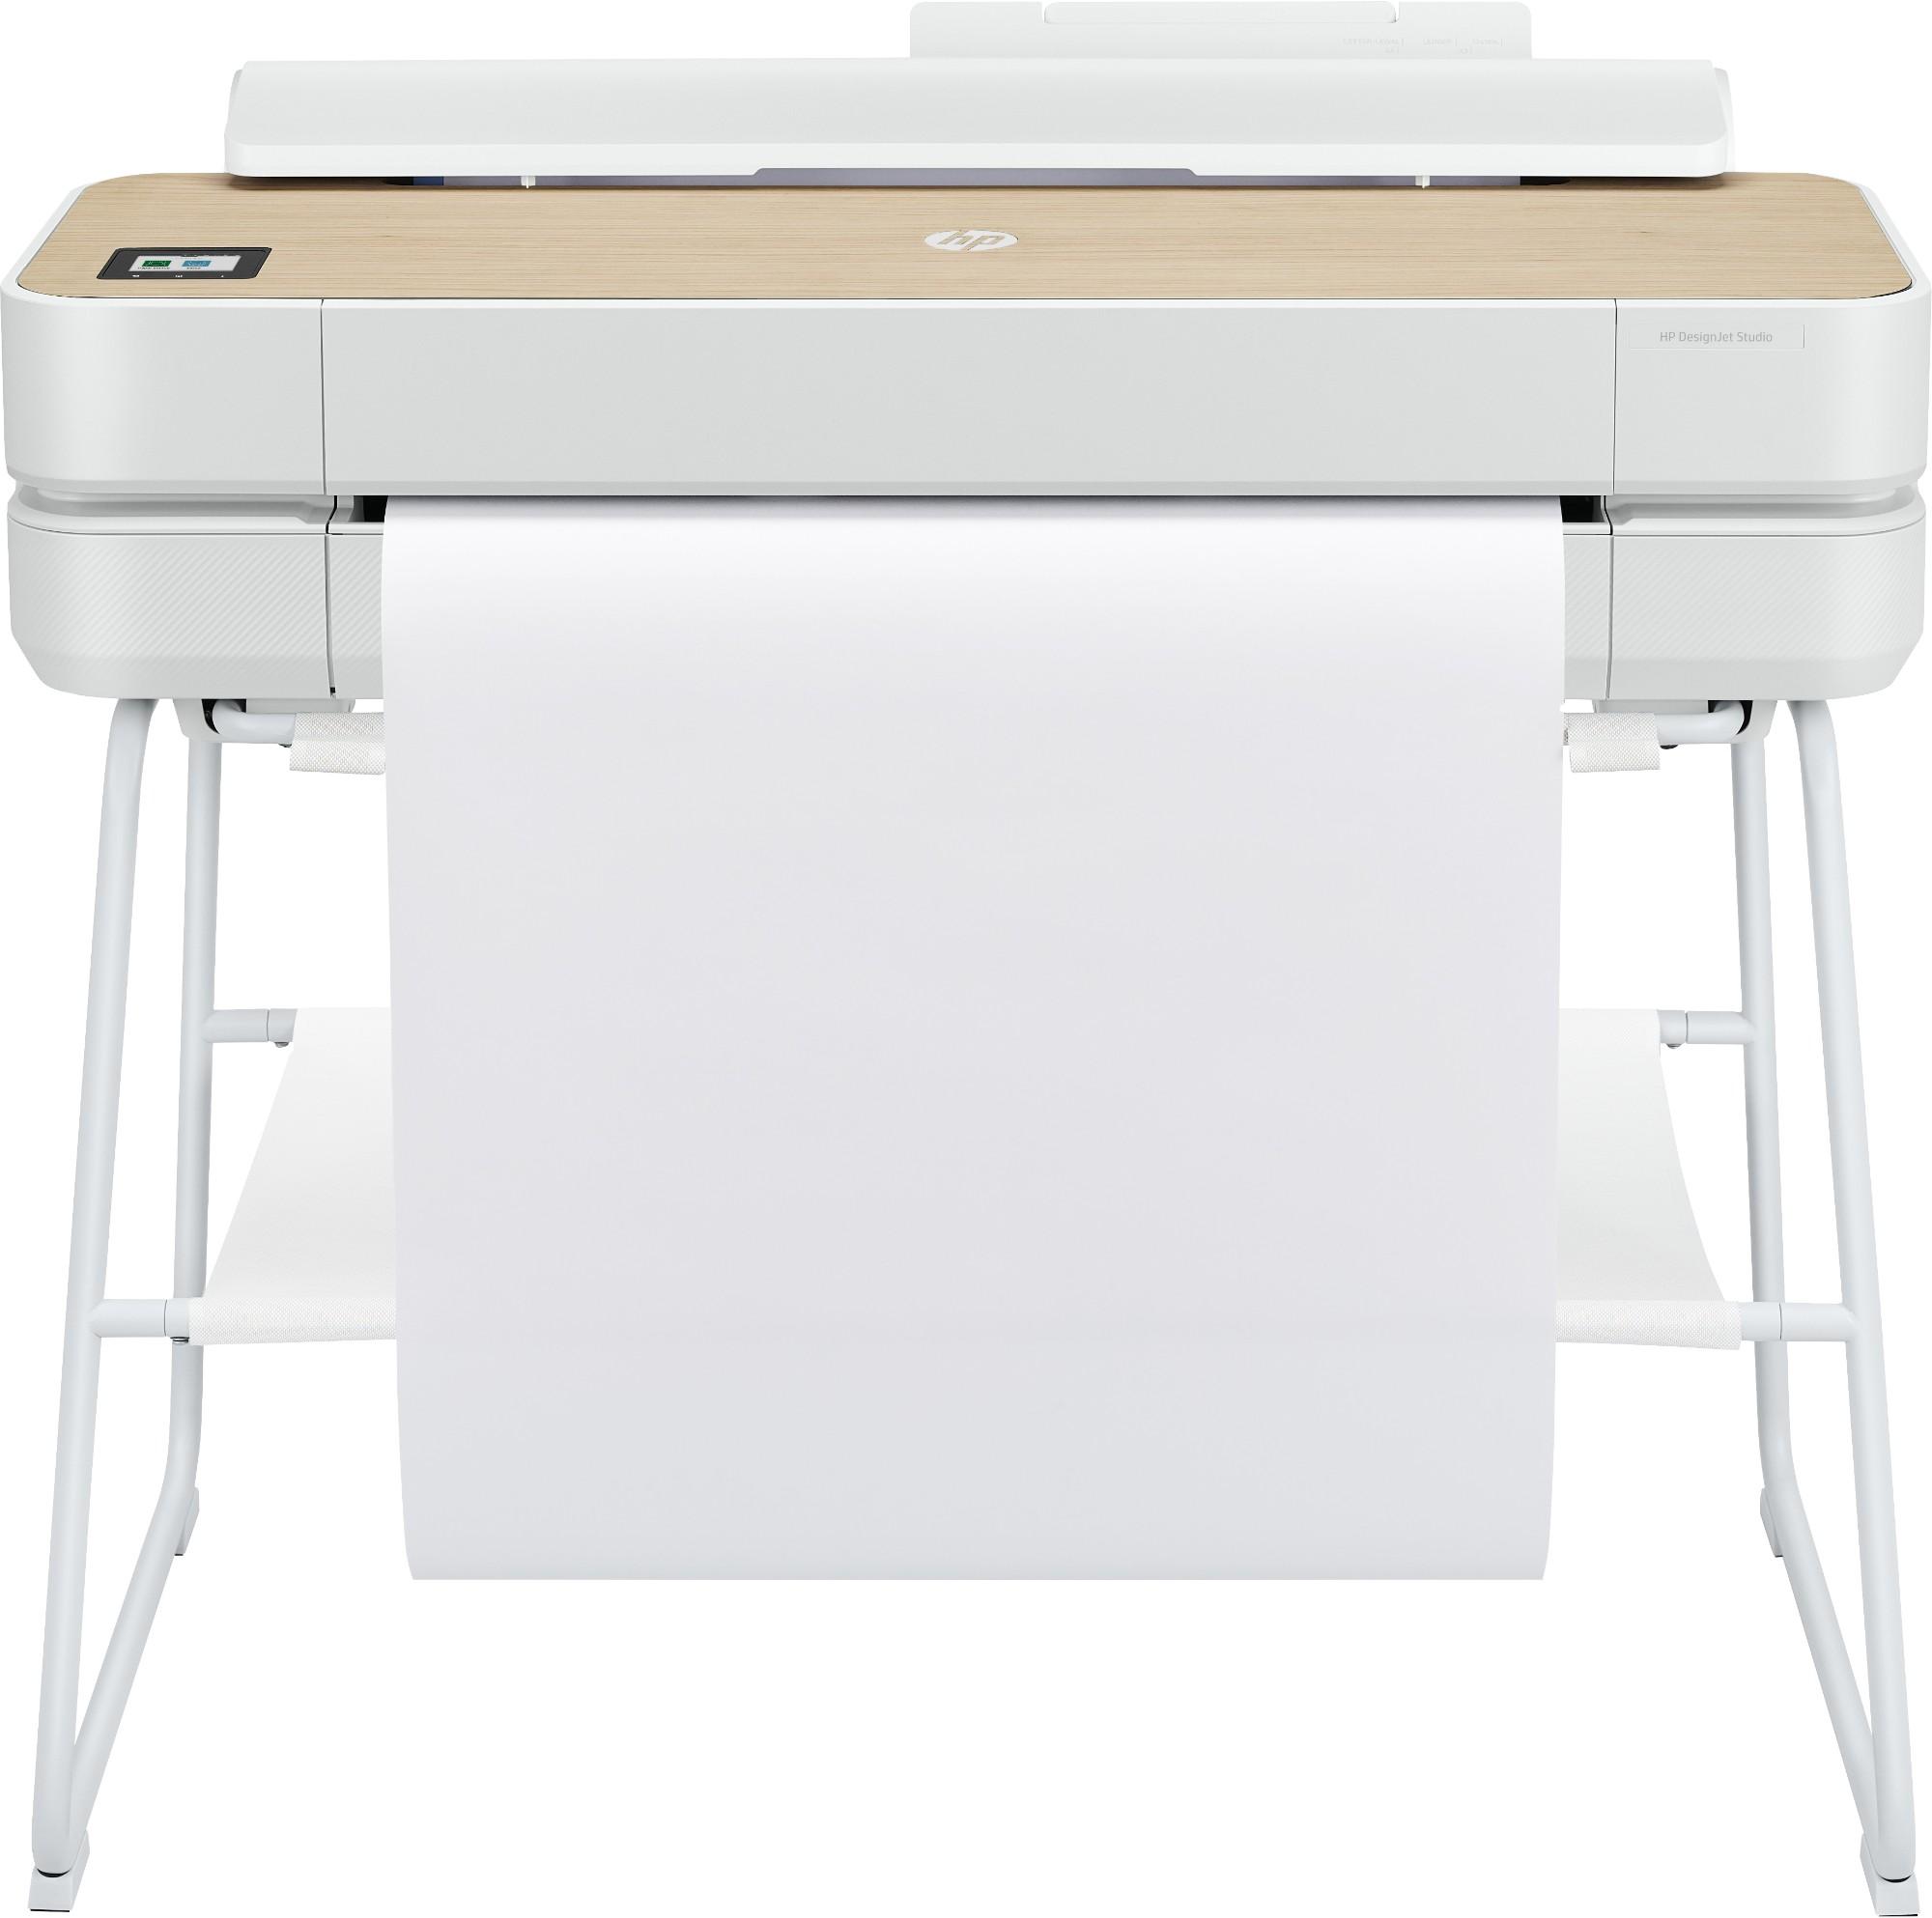 HP Designjet Studio large format printer Wi-Fi Thermal inkjet Colour 2400 x 1200 DPI 610 x 1897 mm Ethernet LAN